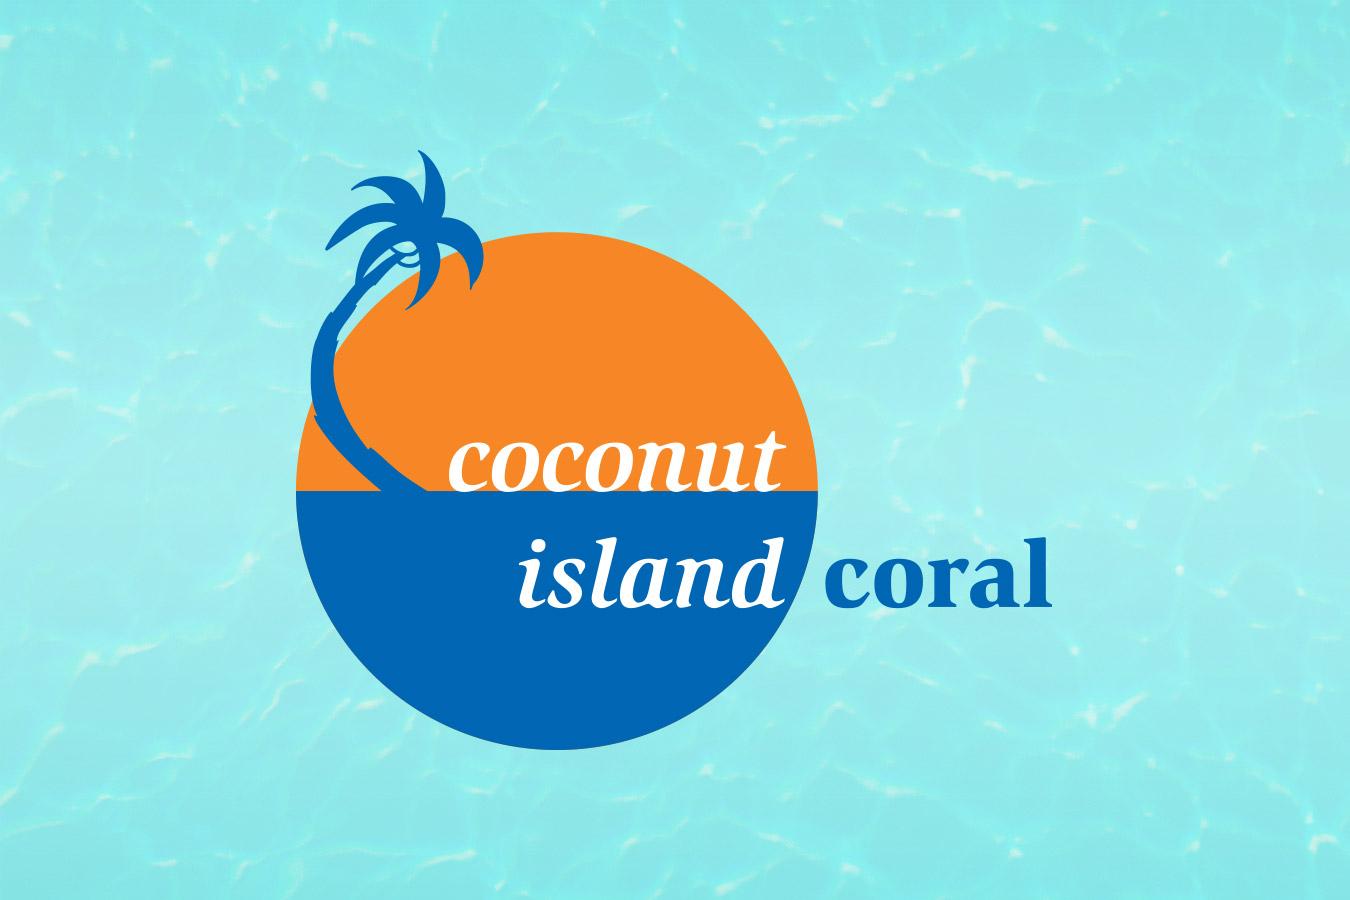 Coconut Island Coral logo